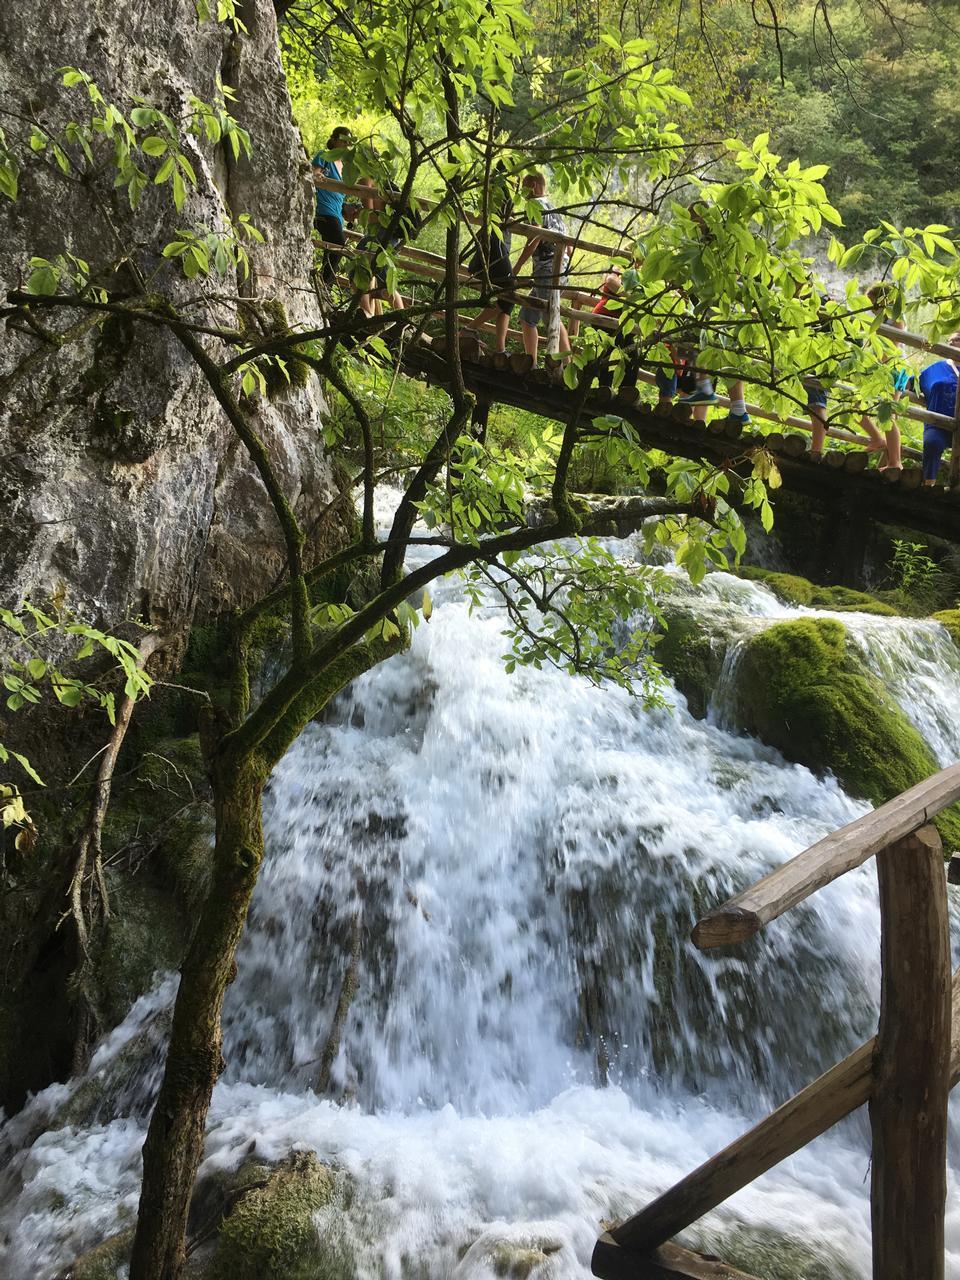 Croatia. Plitvice Lakes National Park. Waterfalls Sostavtsy